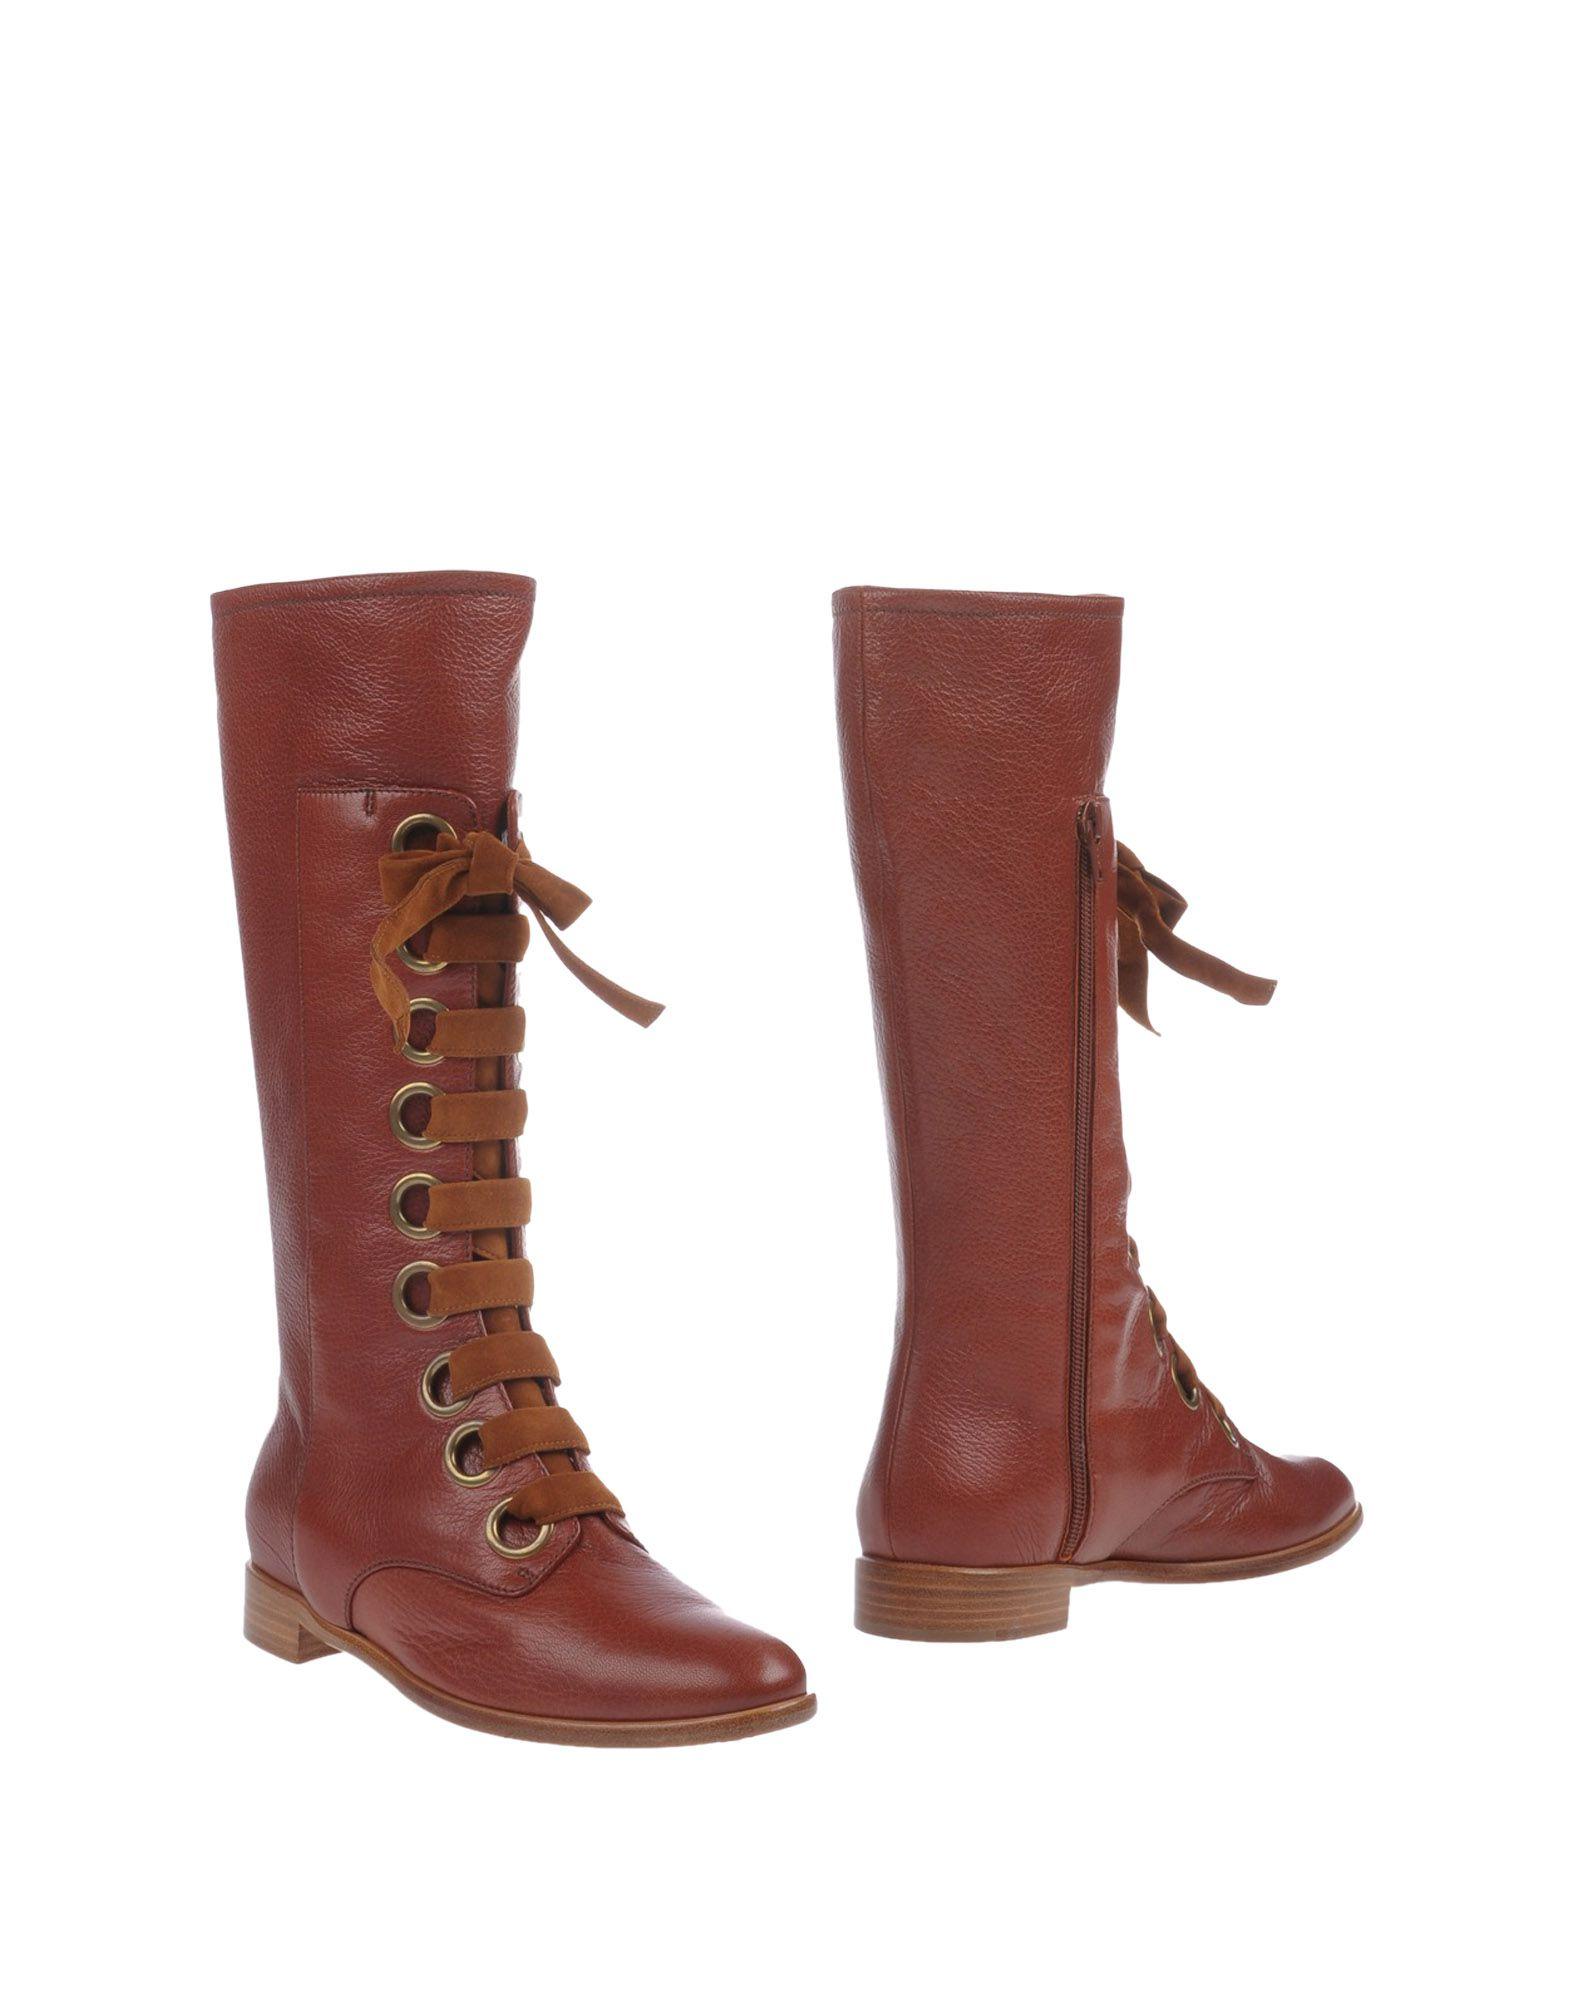 EDMUNDO CASTILLO Boots in Brick Red